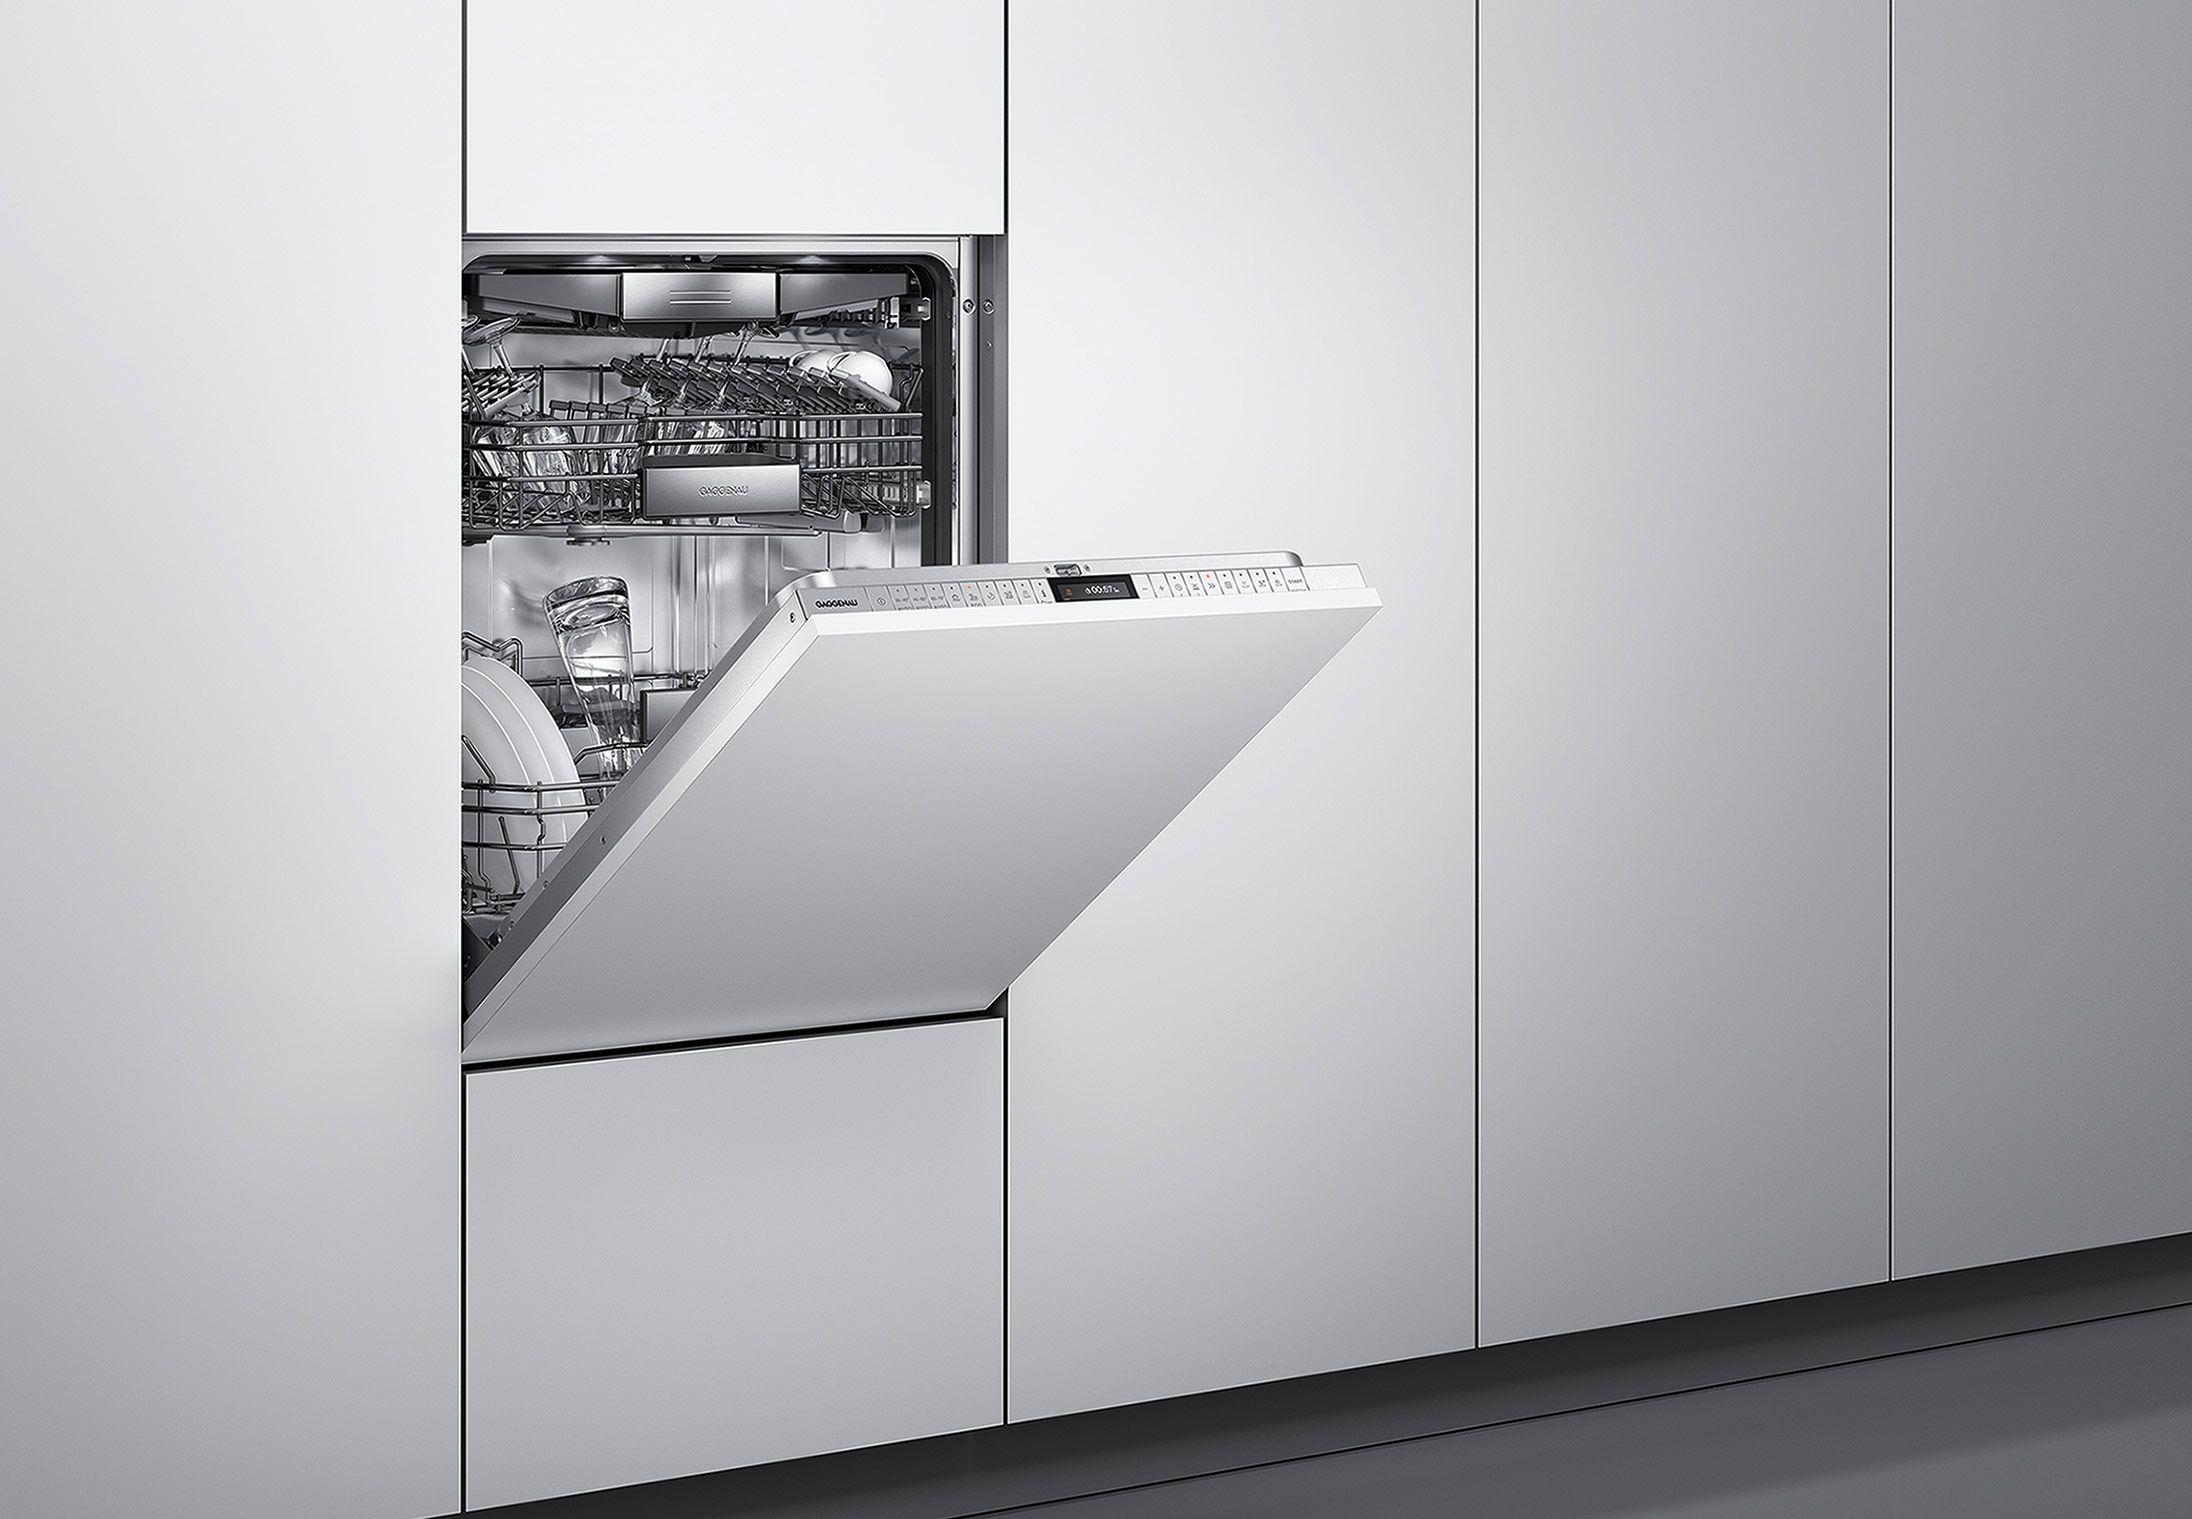 Sci Fi Sleek Kitchen Appliances For Close Quarters Sleek Kitchen Narrow Dishwasher Best Dishwasher